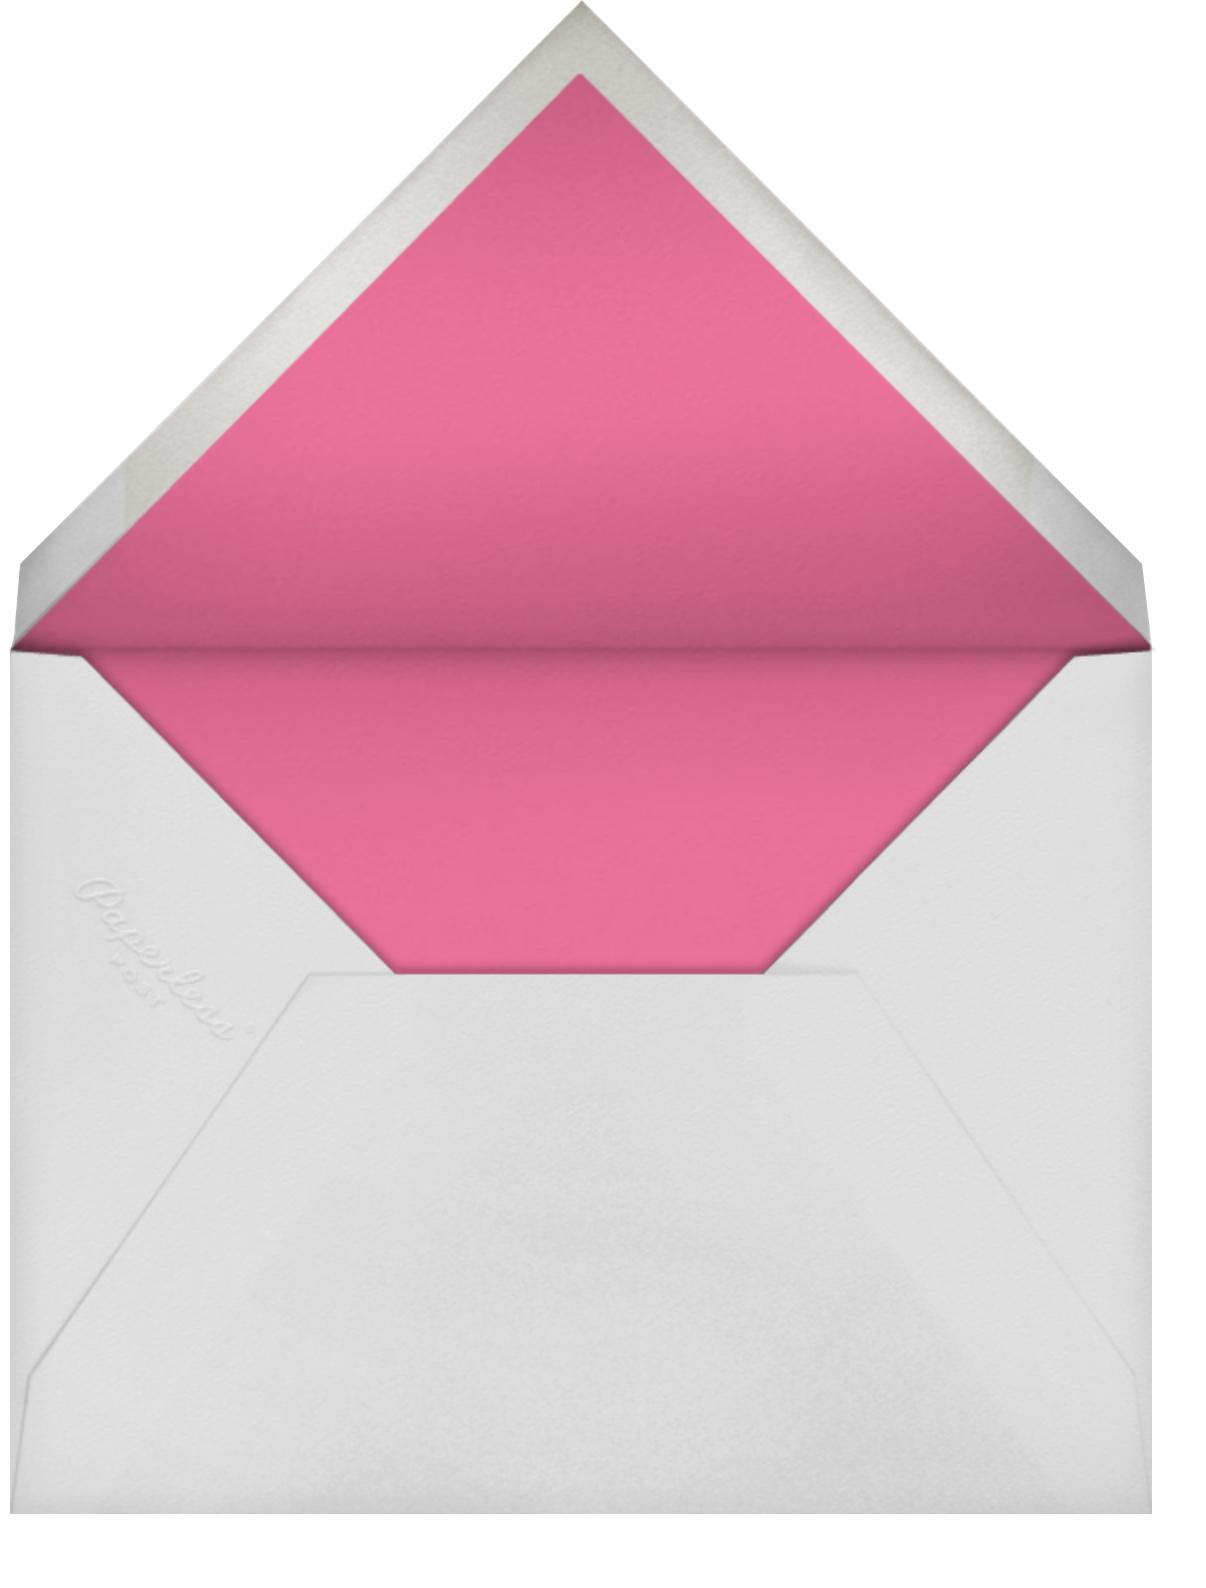 Long Stems - Raspberry - kate spade new york - Valentine's Day - envelope back